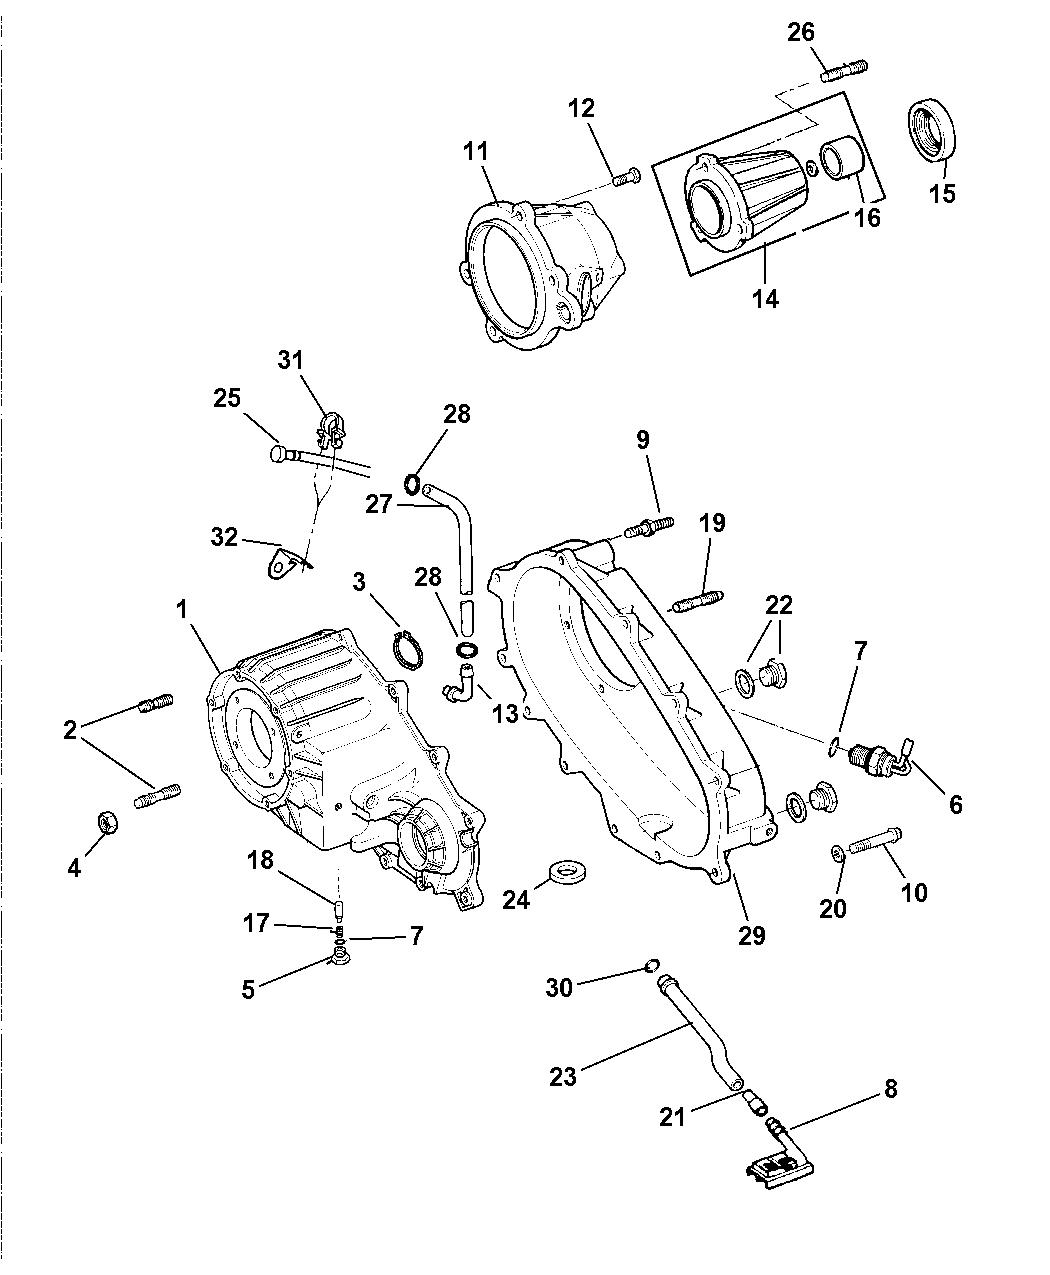 1997 Dodge Dakota Case  U0026 Related Parts Of Transfer Case Model